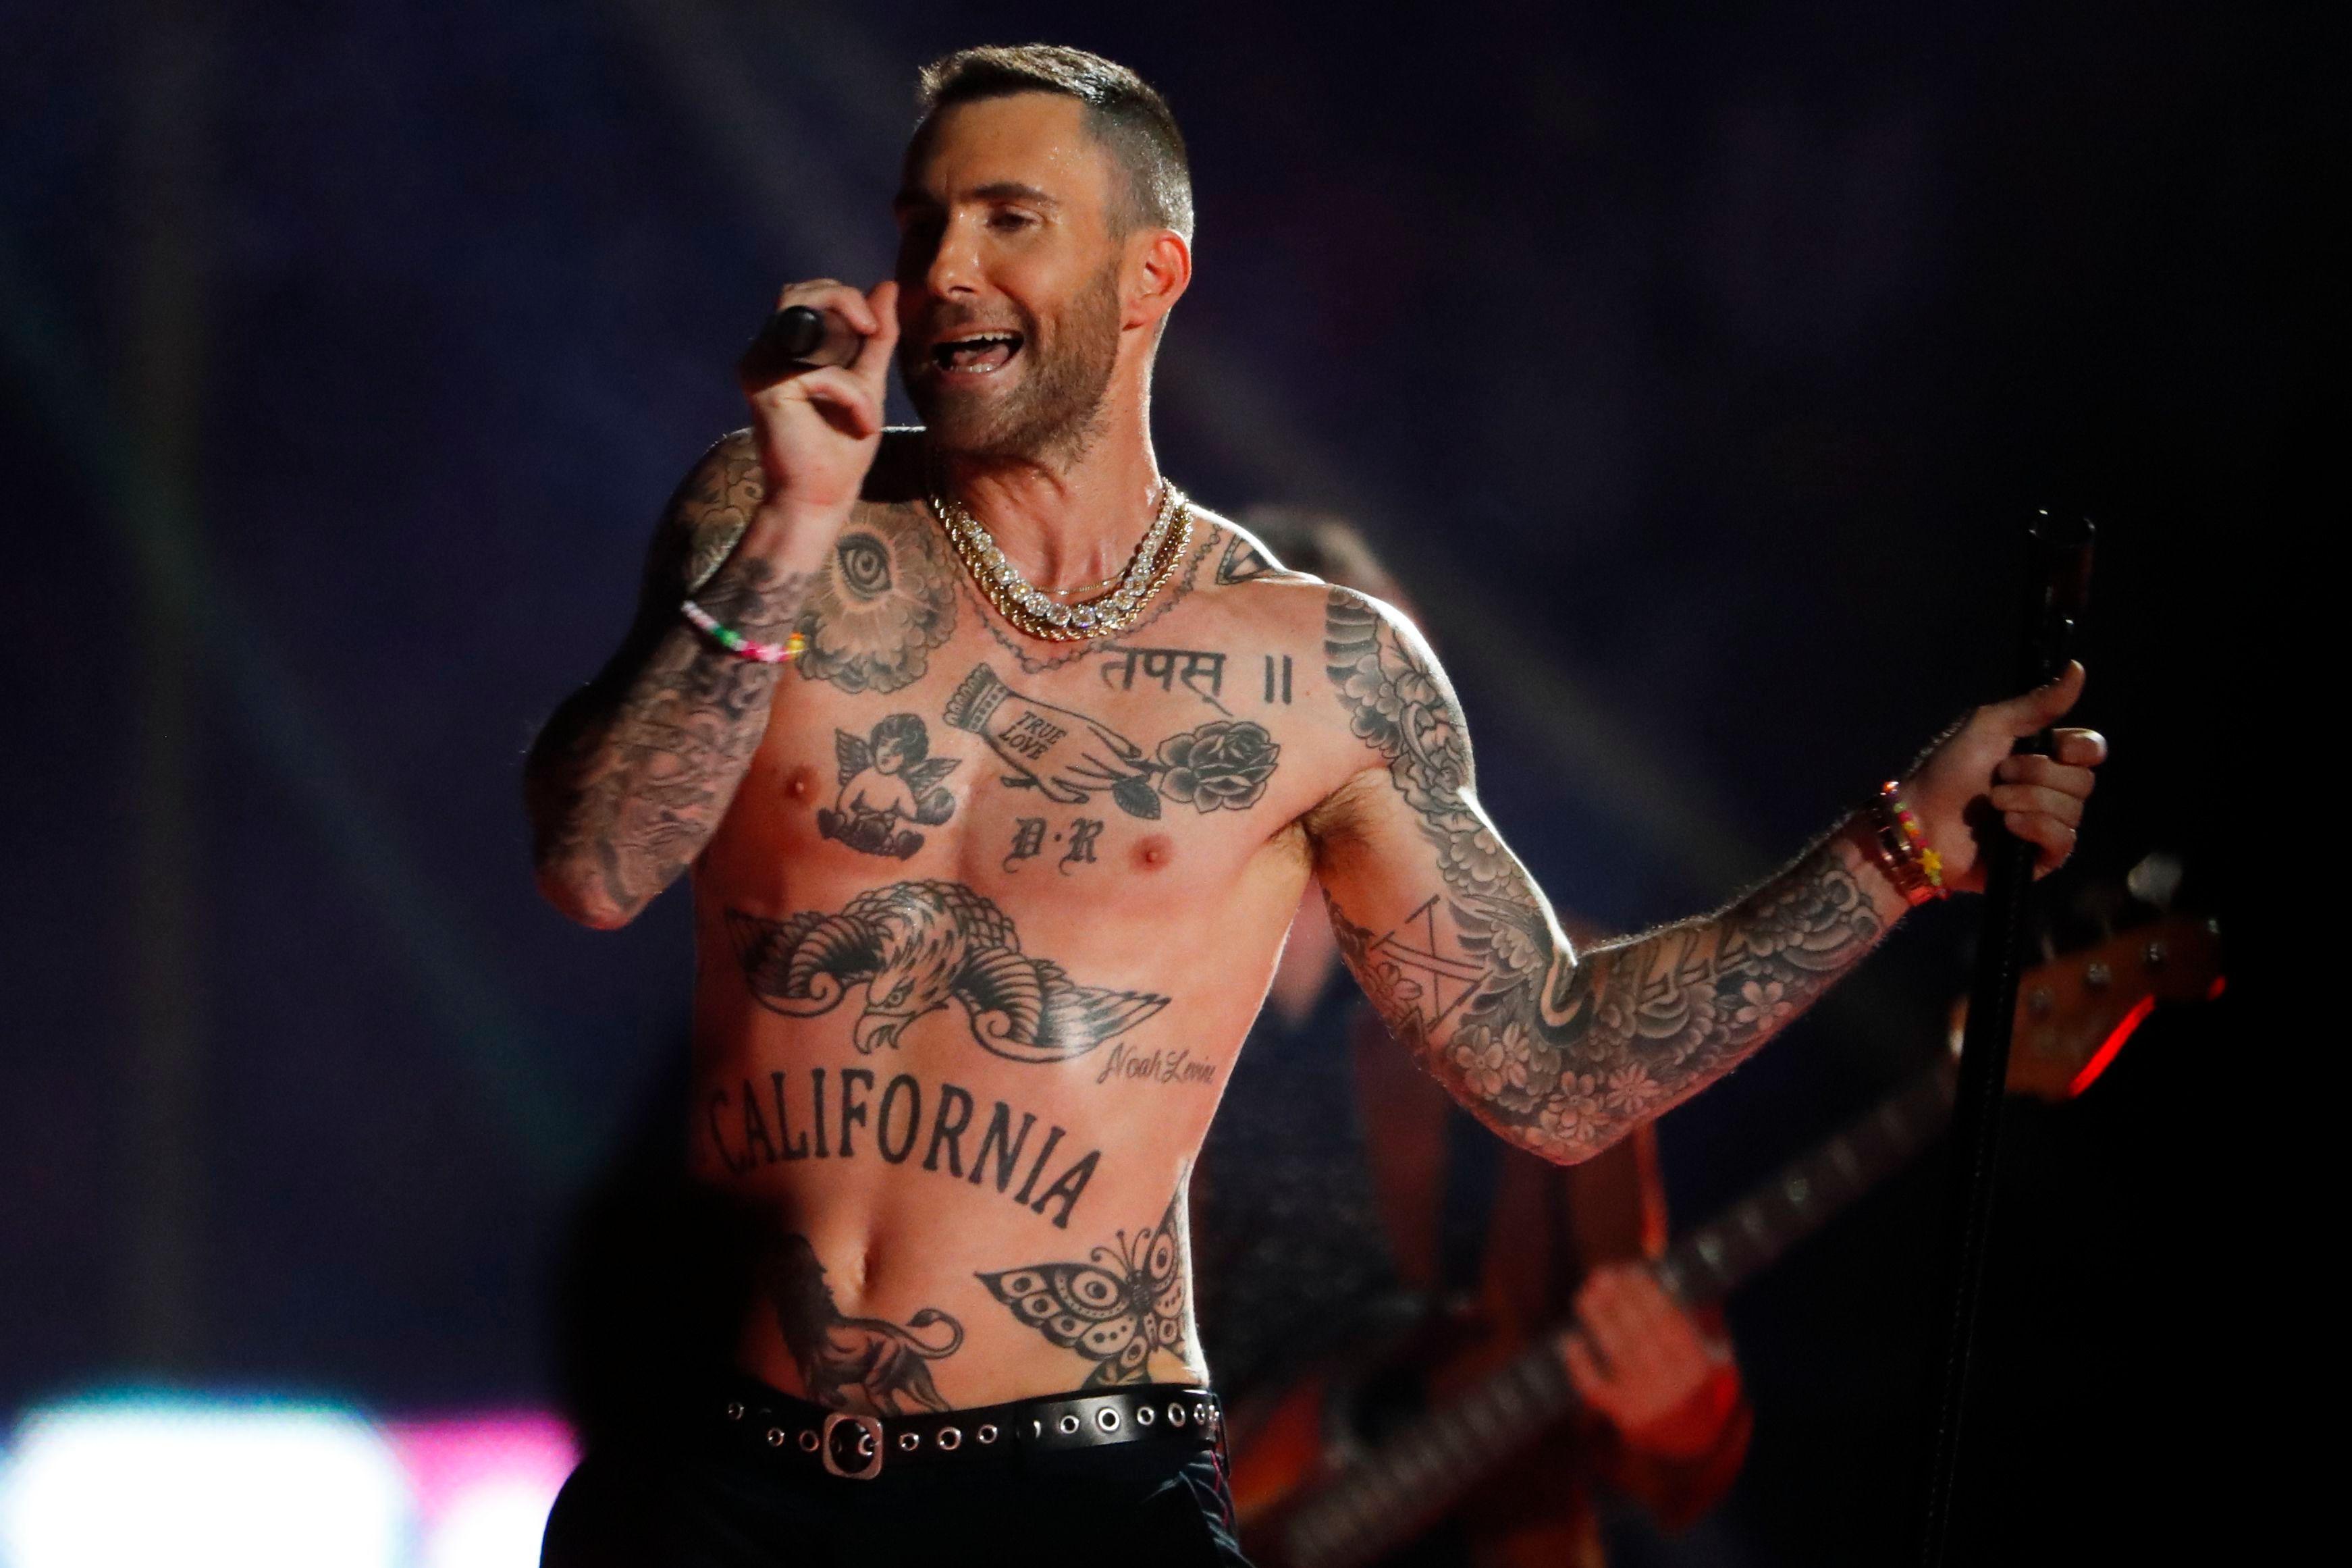 Adam Levine's Nipples at Super Bowl Prompt Complaints to FCC